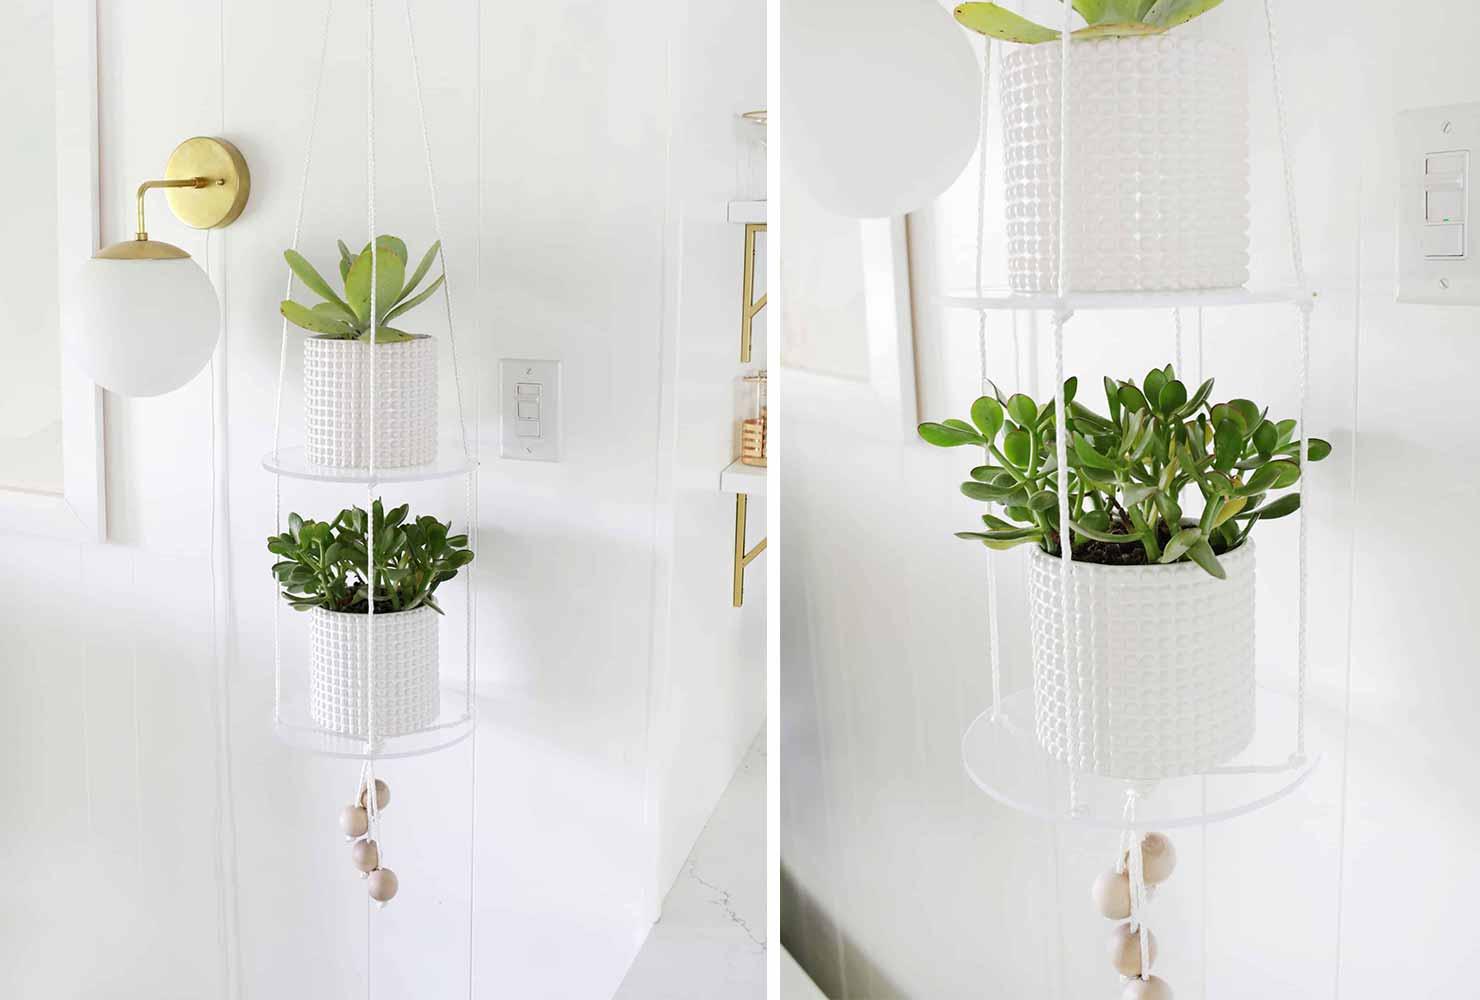 65 Ingenious Indoor Plant Decor Ideas   Shutterfly on Plant Hanging Ideas  id=51178